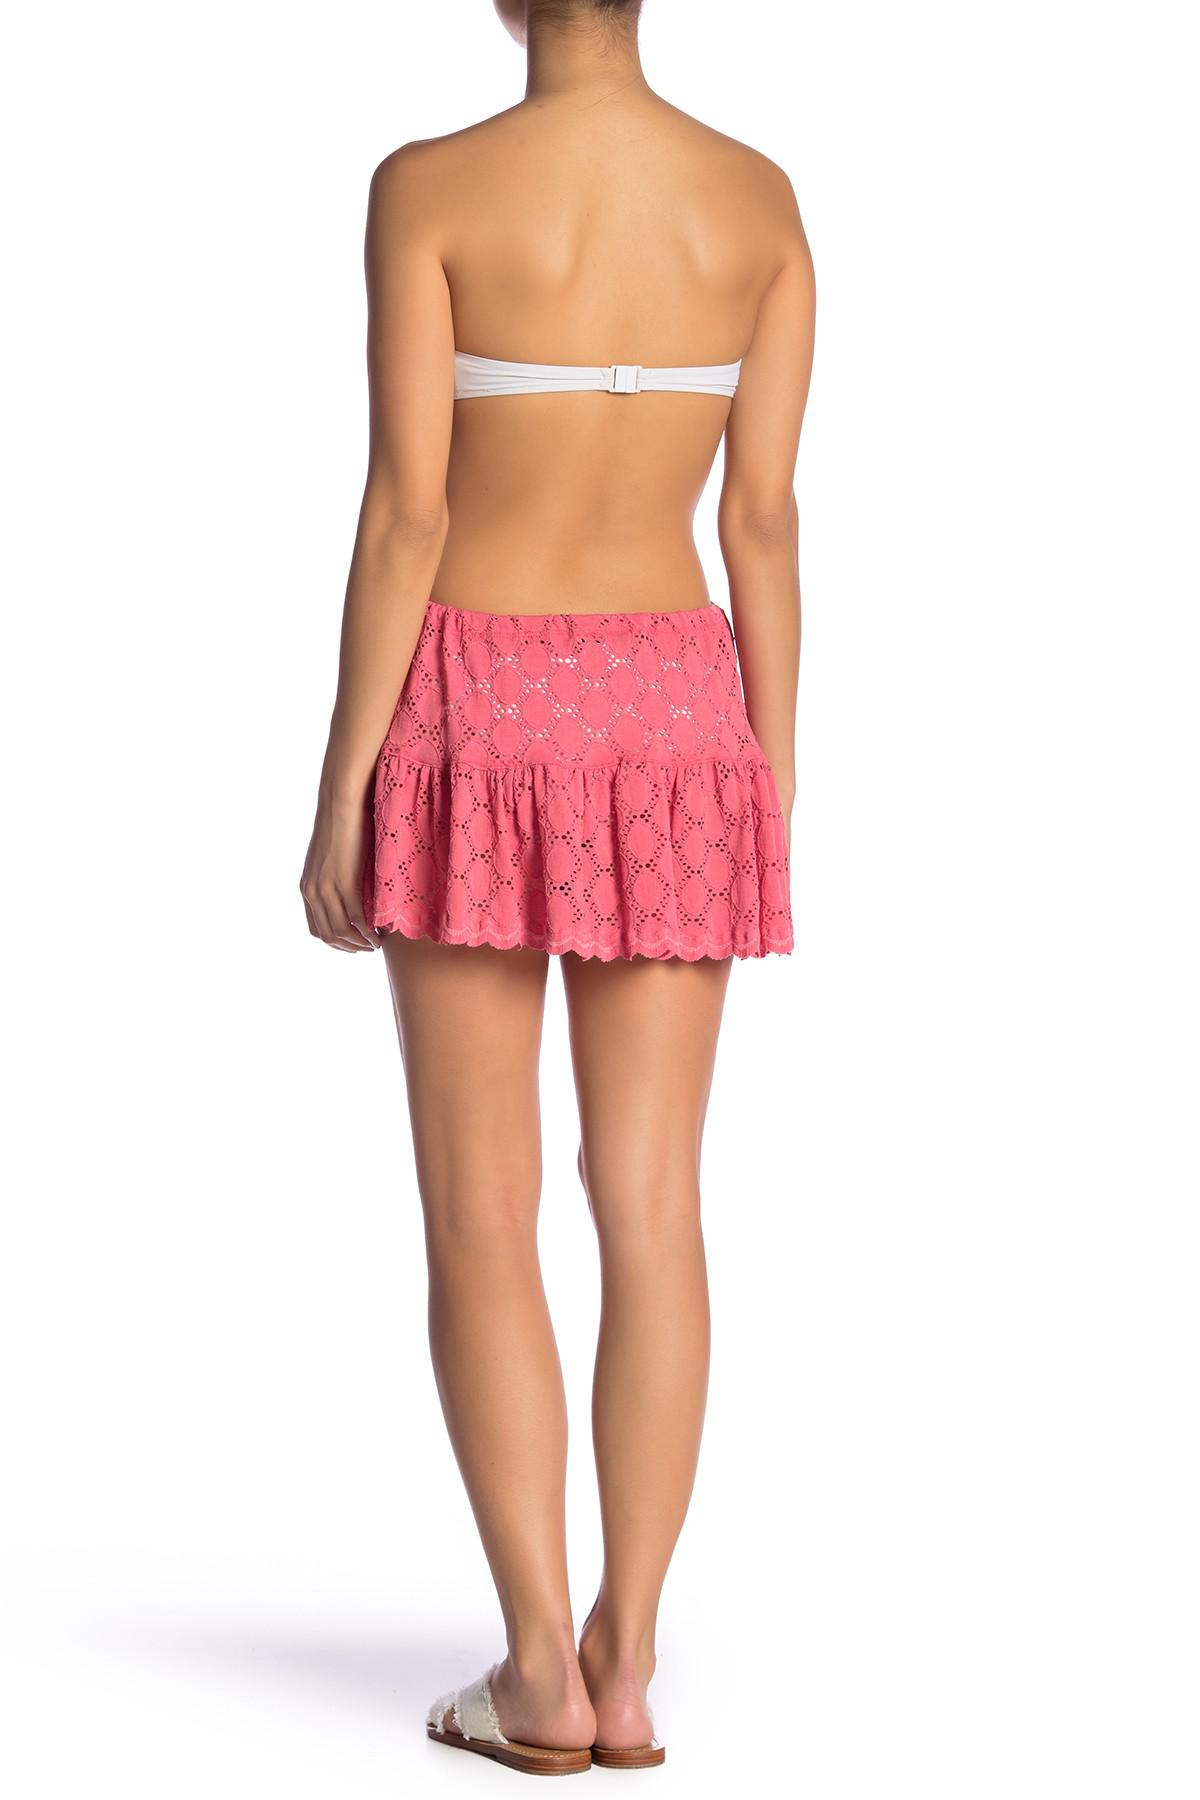 a3d083d0c1 Lyst - J Valdi Ruffle Eyelet Skirt in Pink